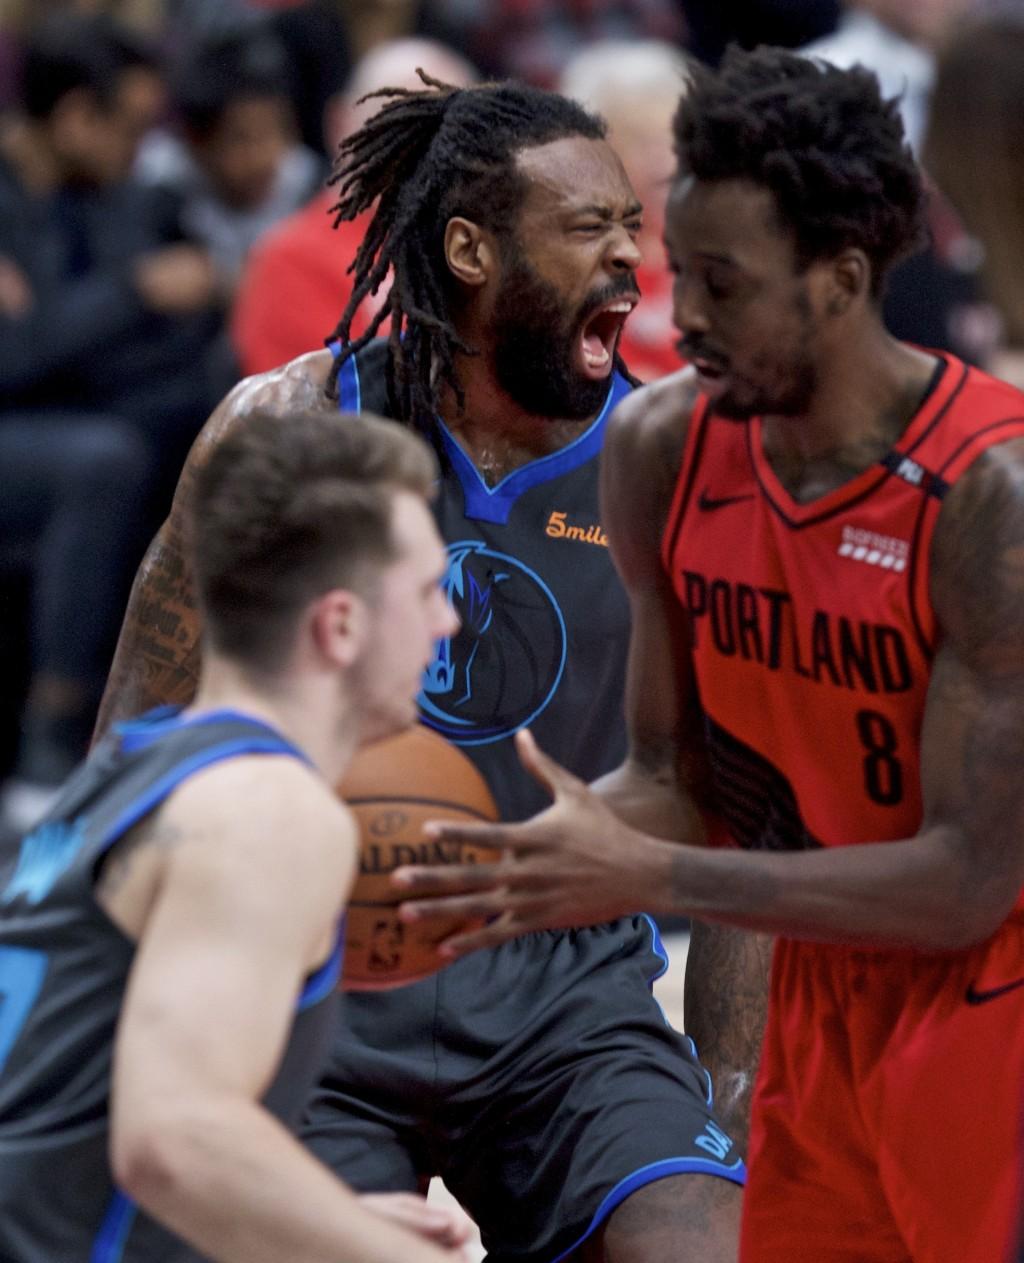 Dallas Mavericks center DeAndre Jordan, back left, reacts after scoring over Portland Trail Blazers forward Al-Farouq Aminu during the first half of a...